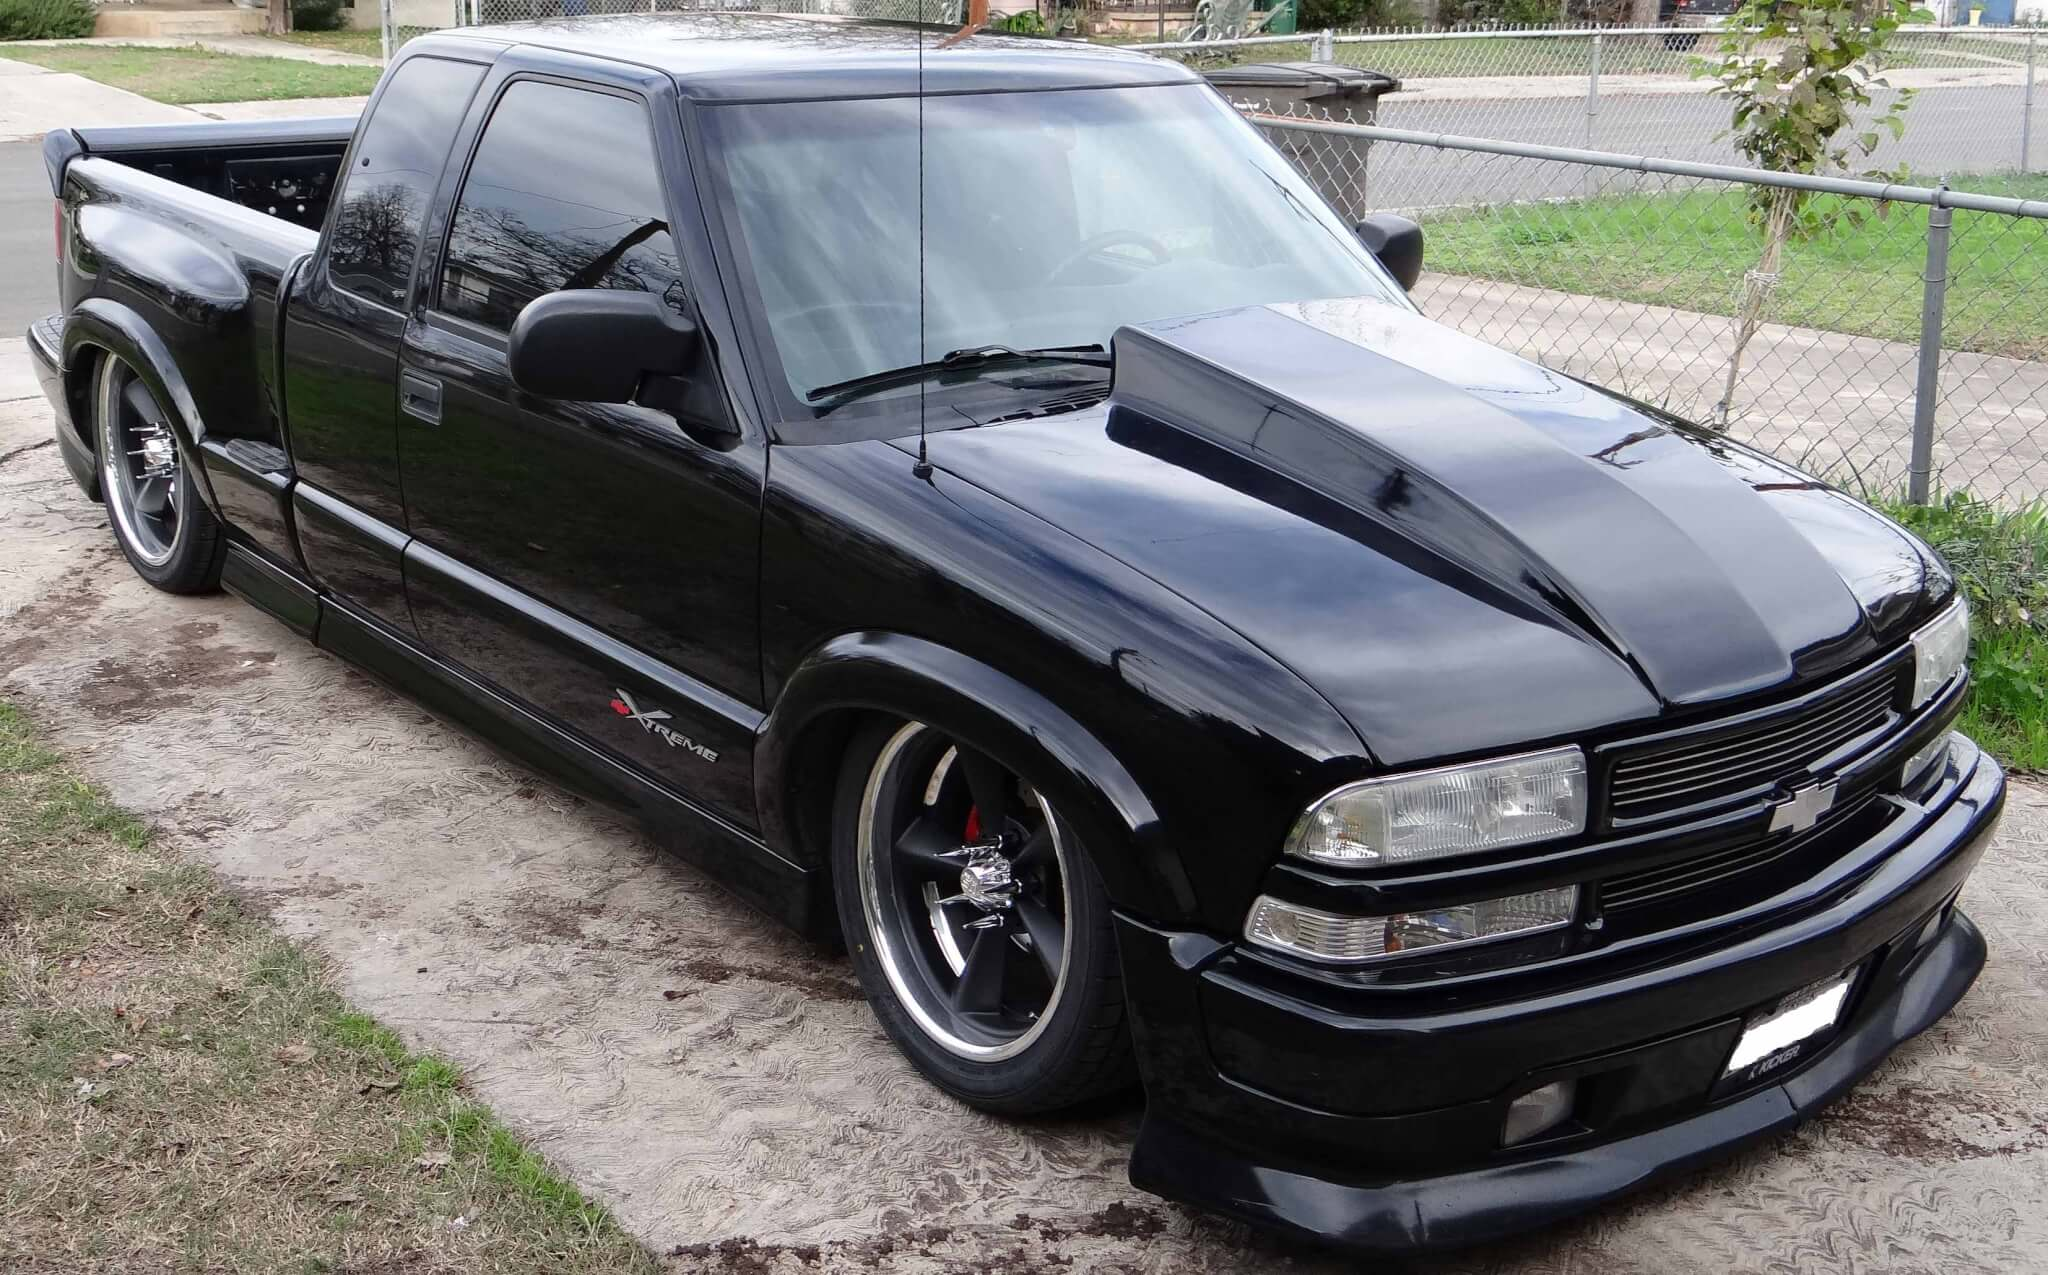 2001 Chevrolet S10 Xtreme - Joe Harrison III - LMC Truck Life